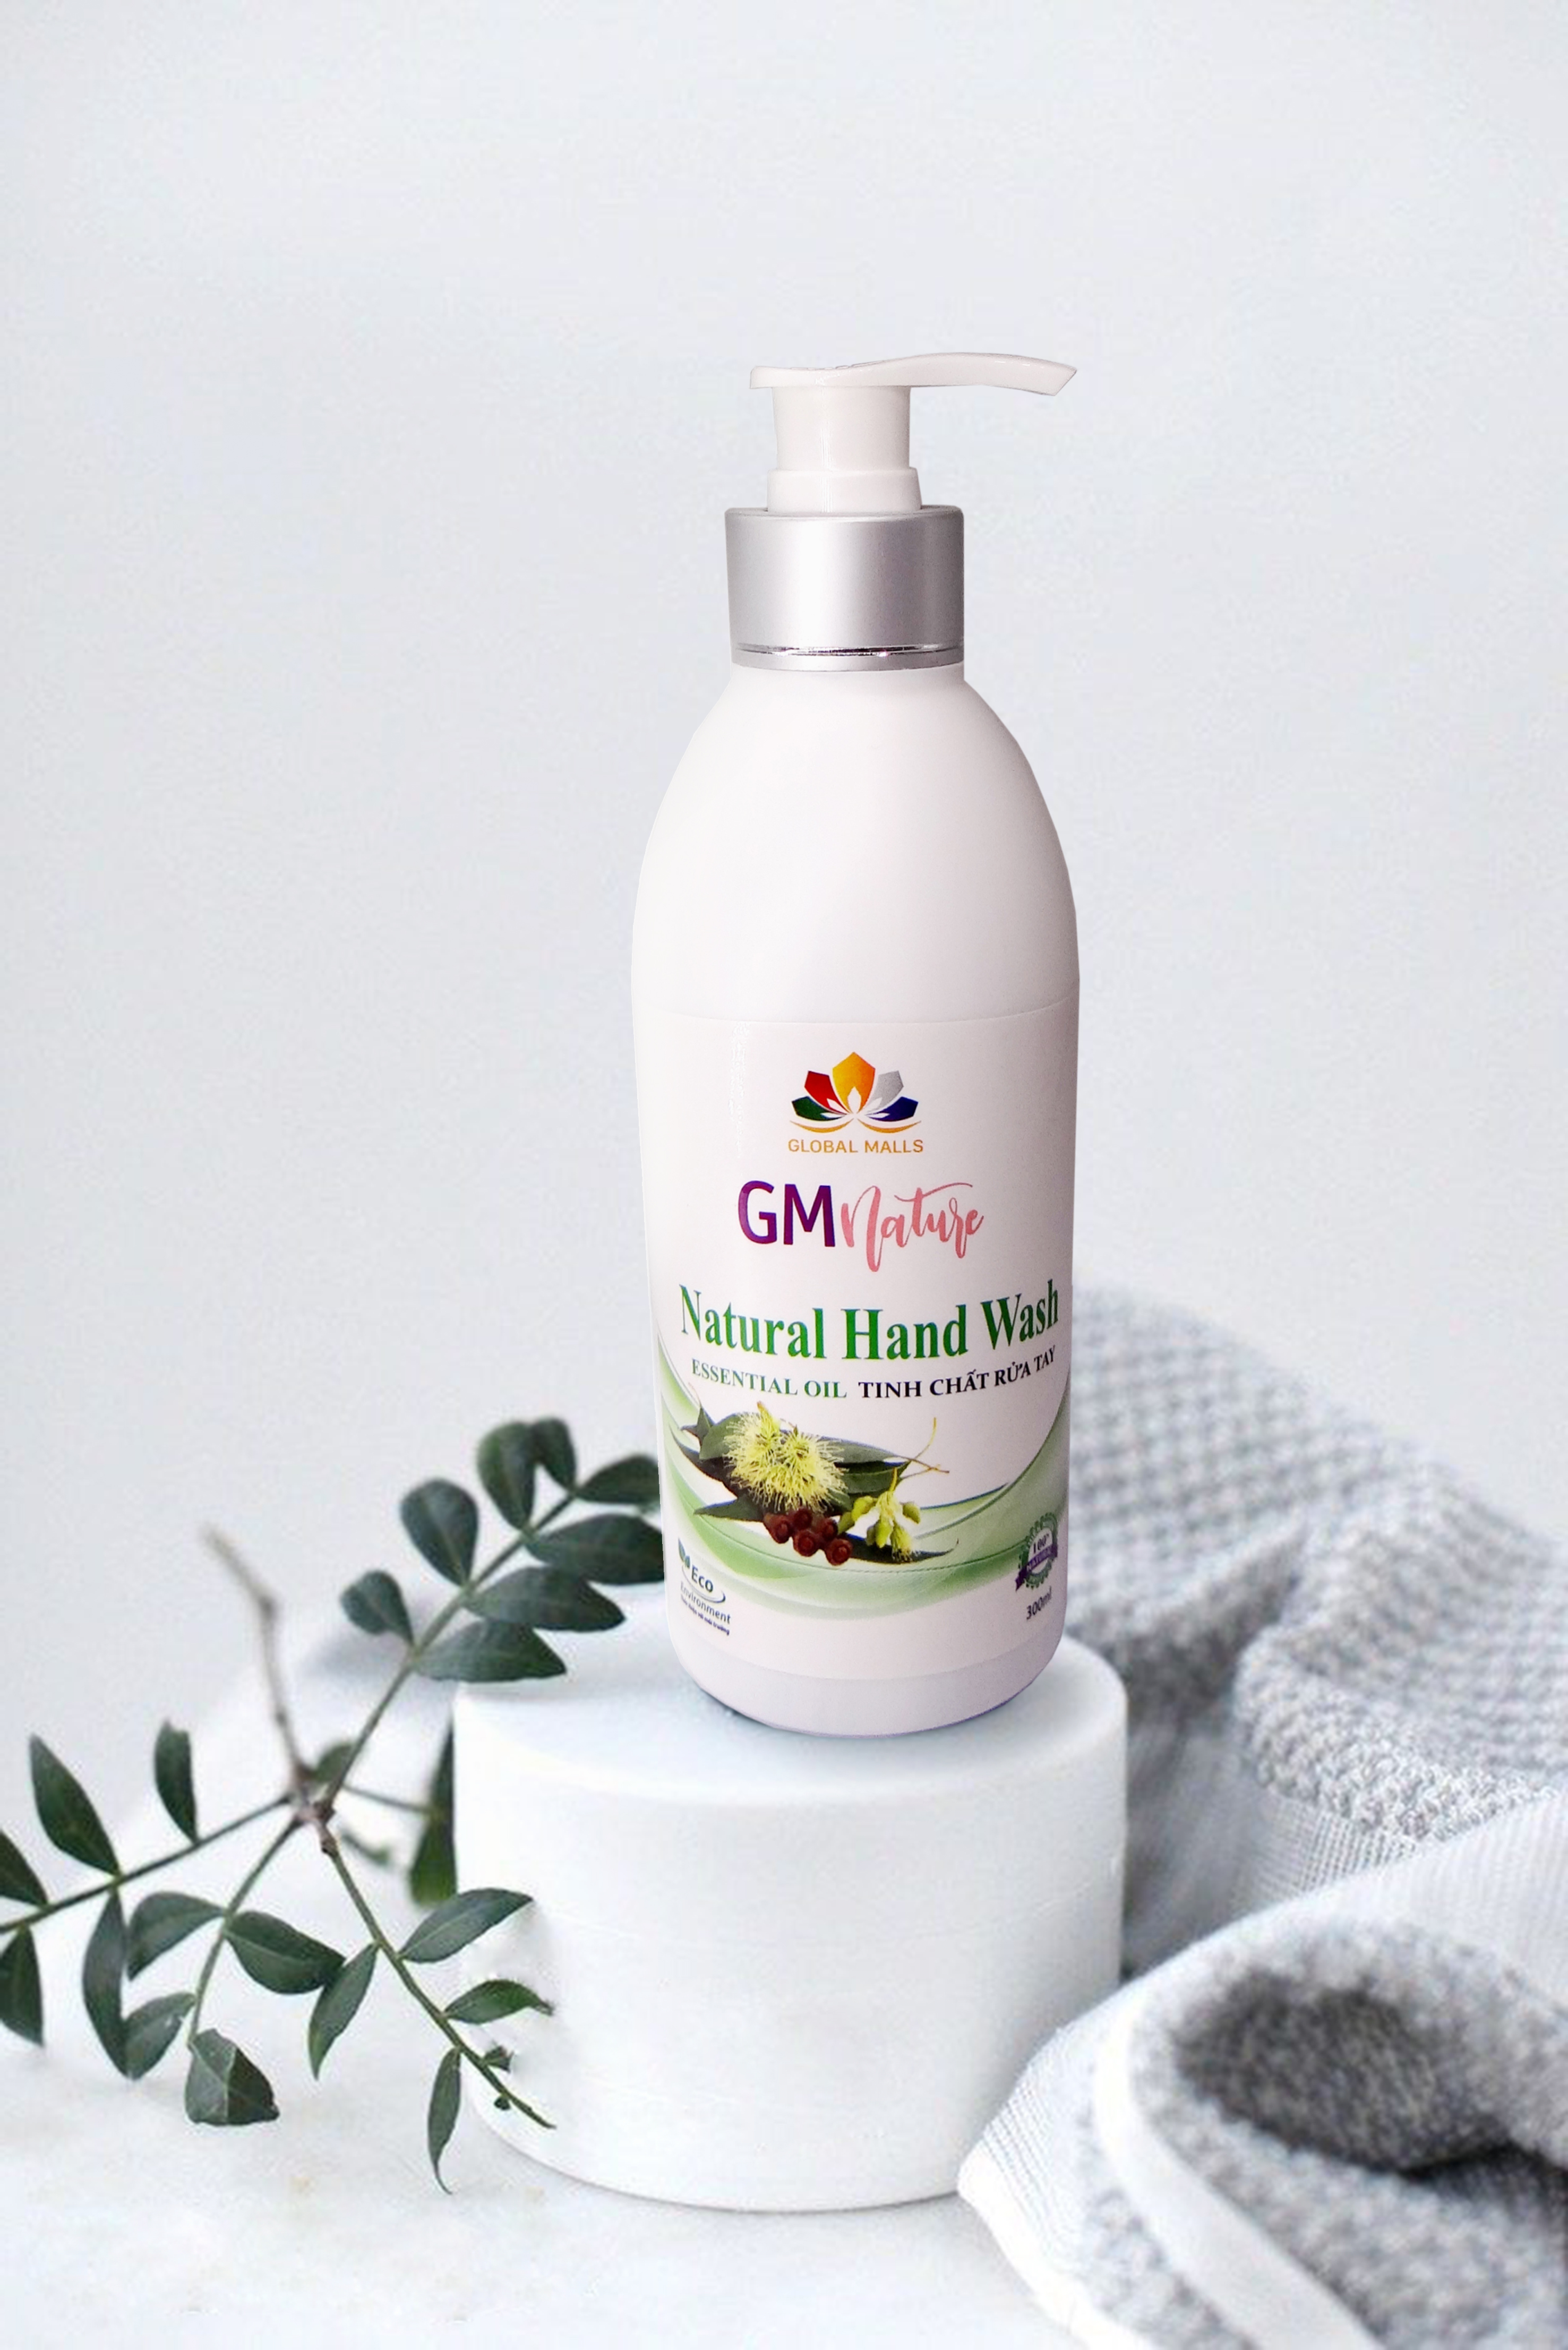 Tinh chất rửa tay GMnature